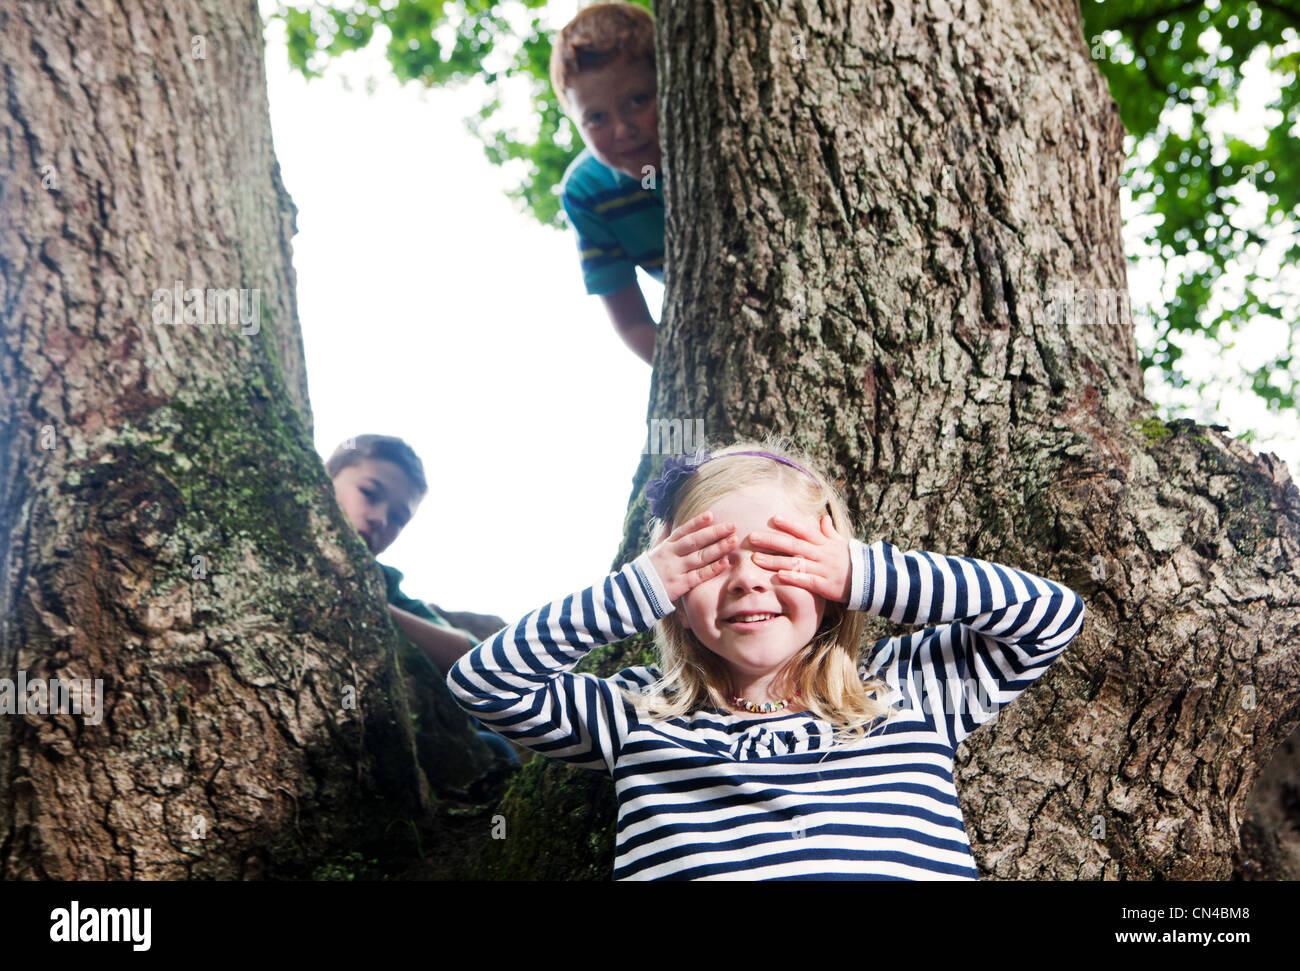 Hide Seek Kids: Climbing Down A Tree Stock Photos & Climbing Down A Tree